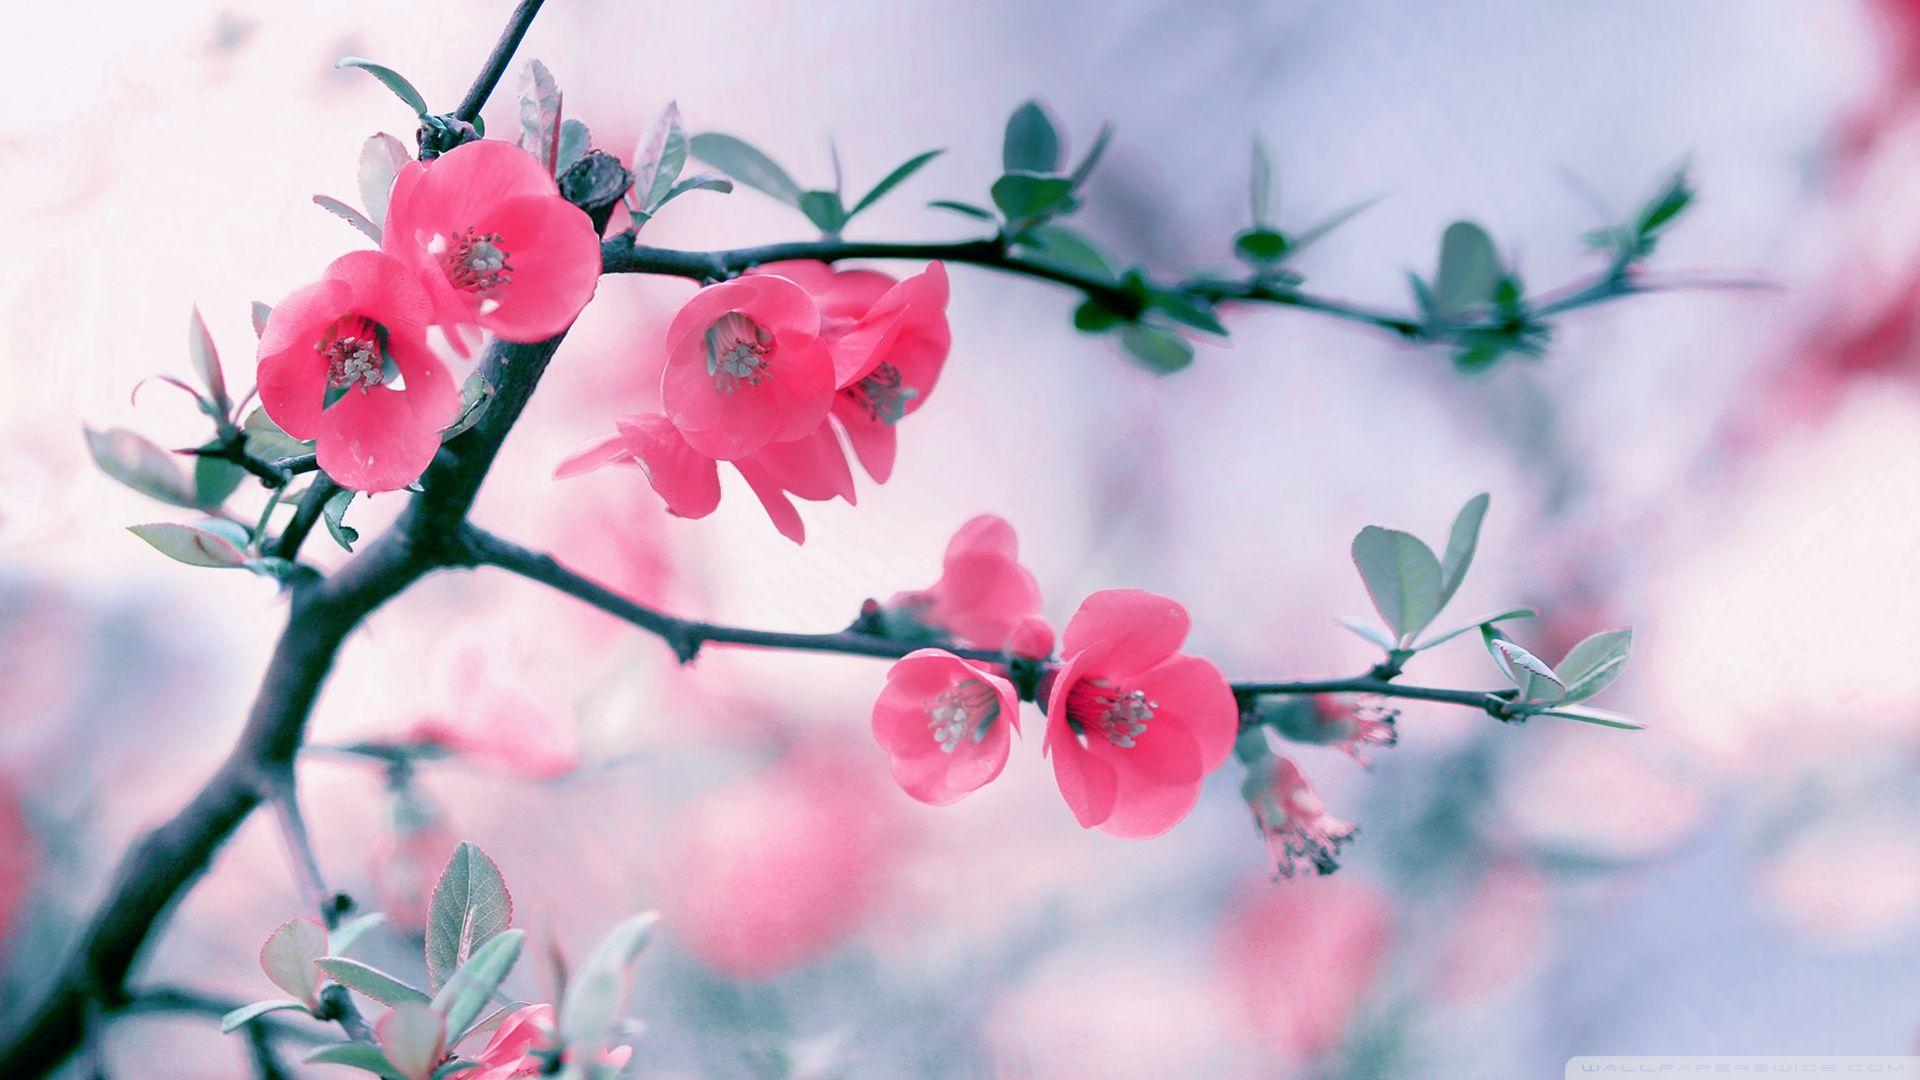 Download Pink Flower Spring Blossom Flowers 1920x1080